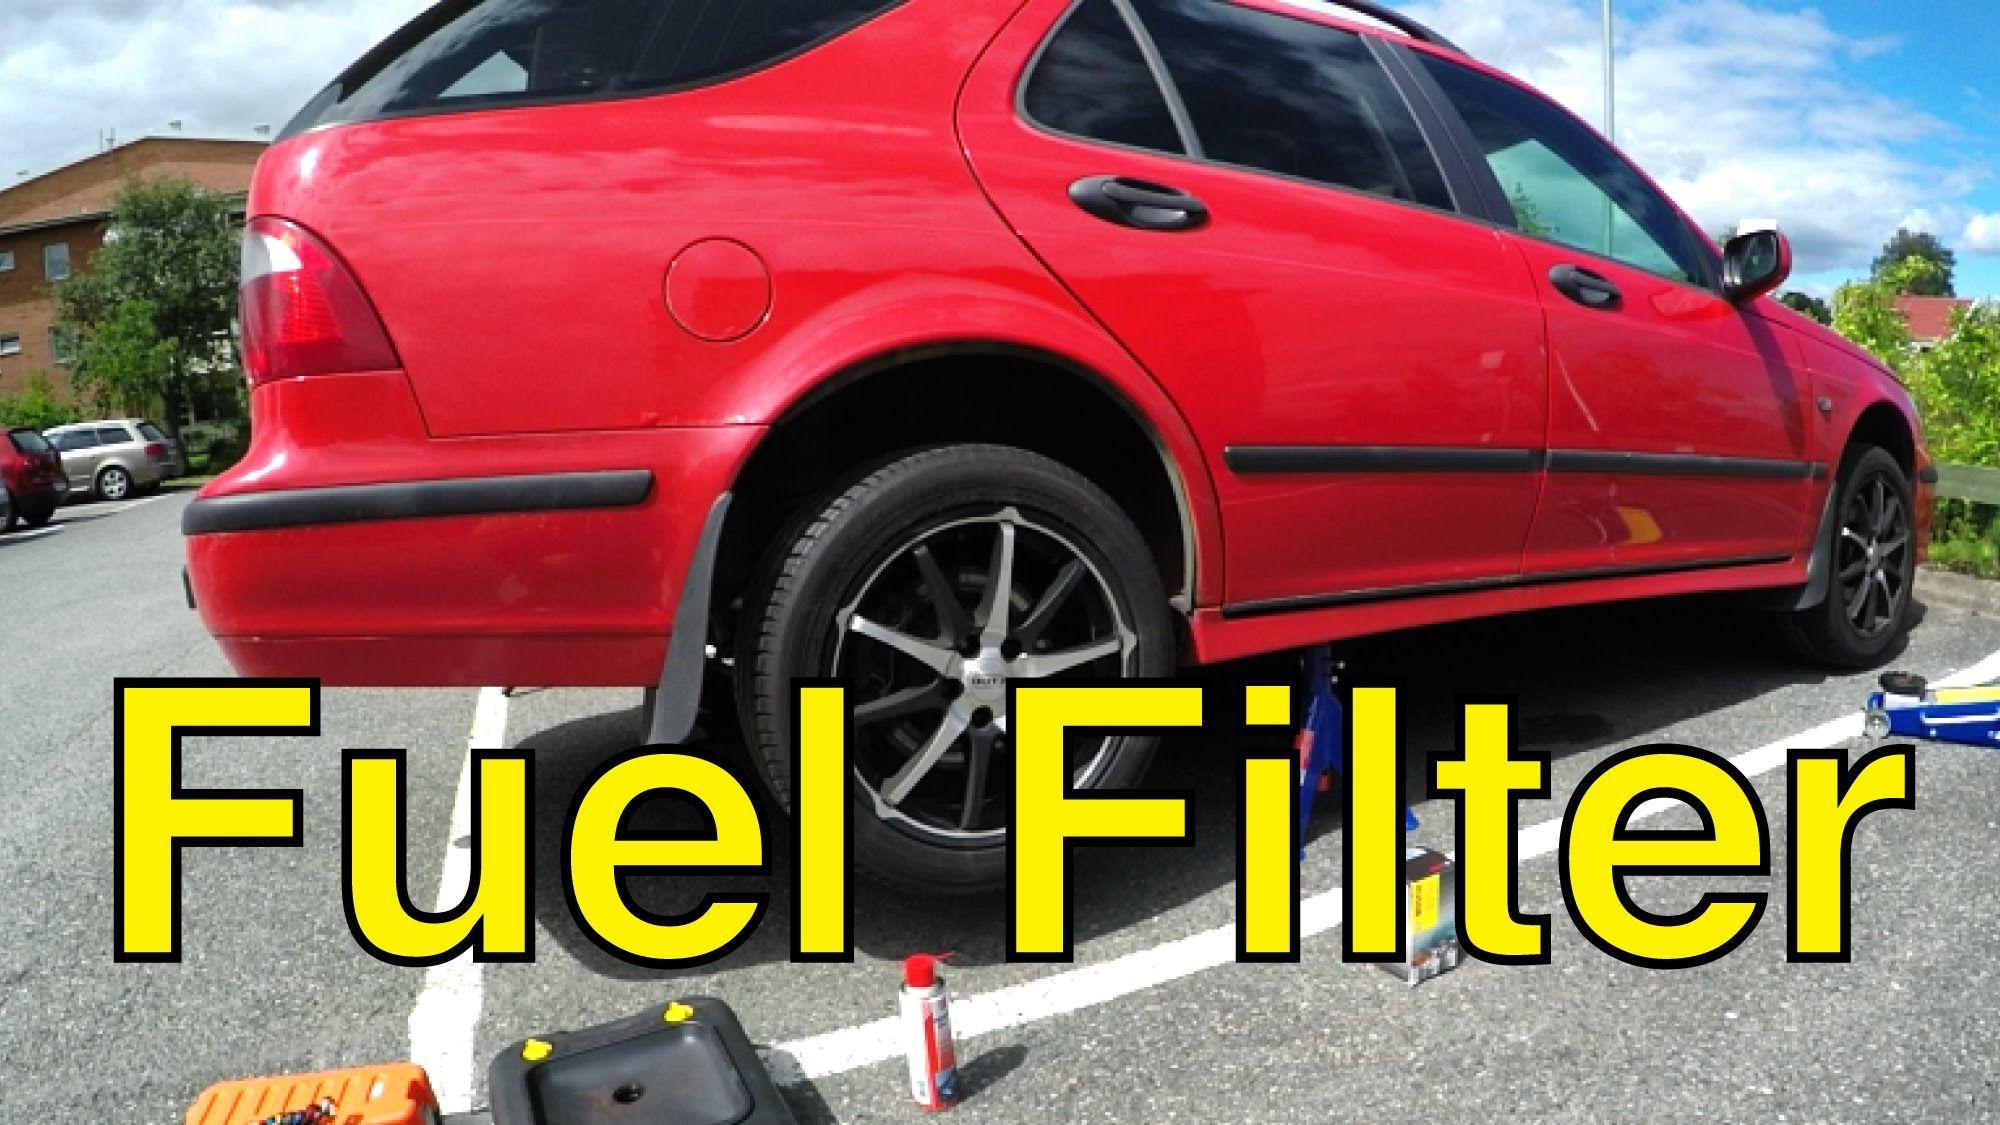 saab 9 5 diy fuel filter replacement trionic seven [ 2000 x 1125 Pixel ]